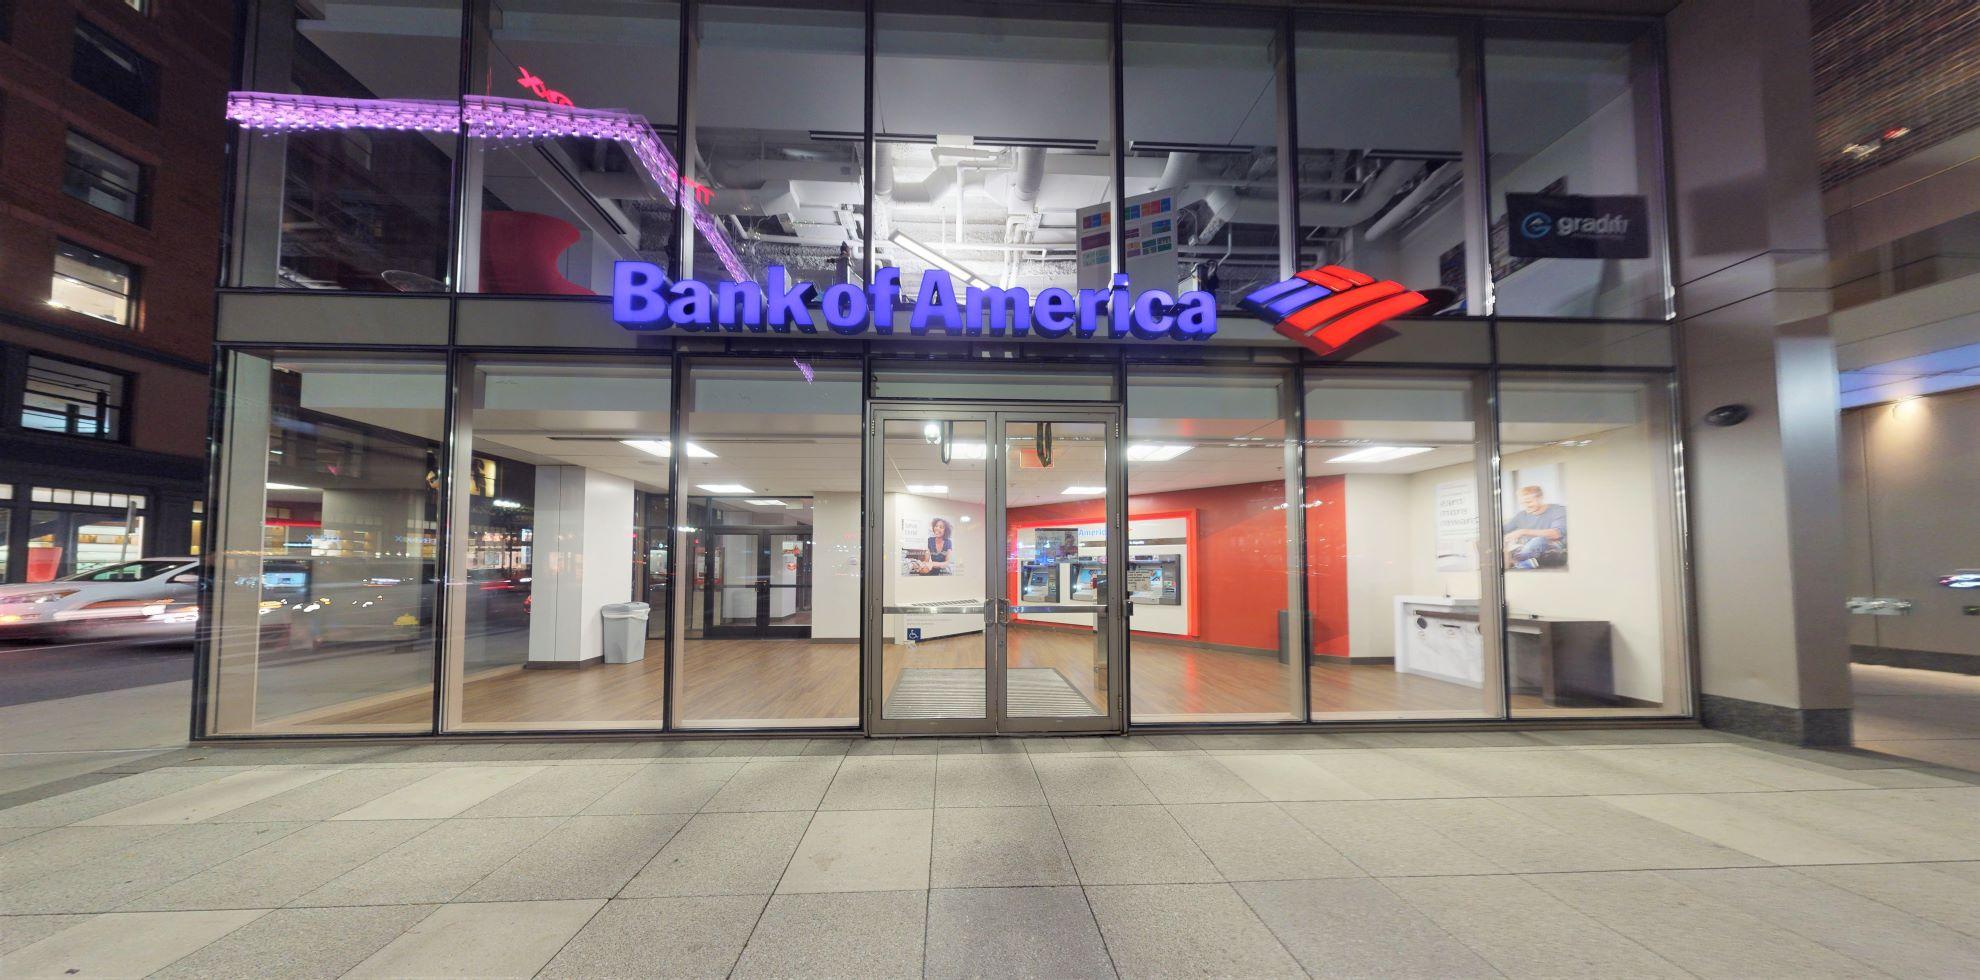 Bank of America ATM & Financial Center Near You | 699 Boylston St., Boston, MA 02116